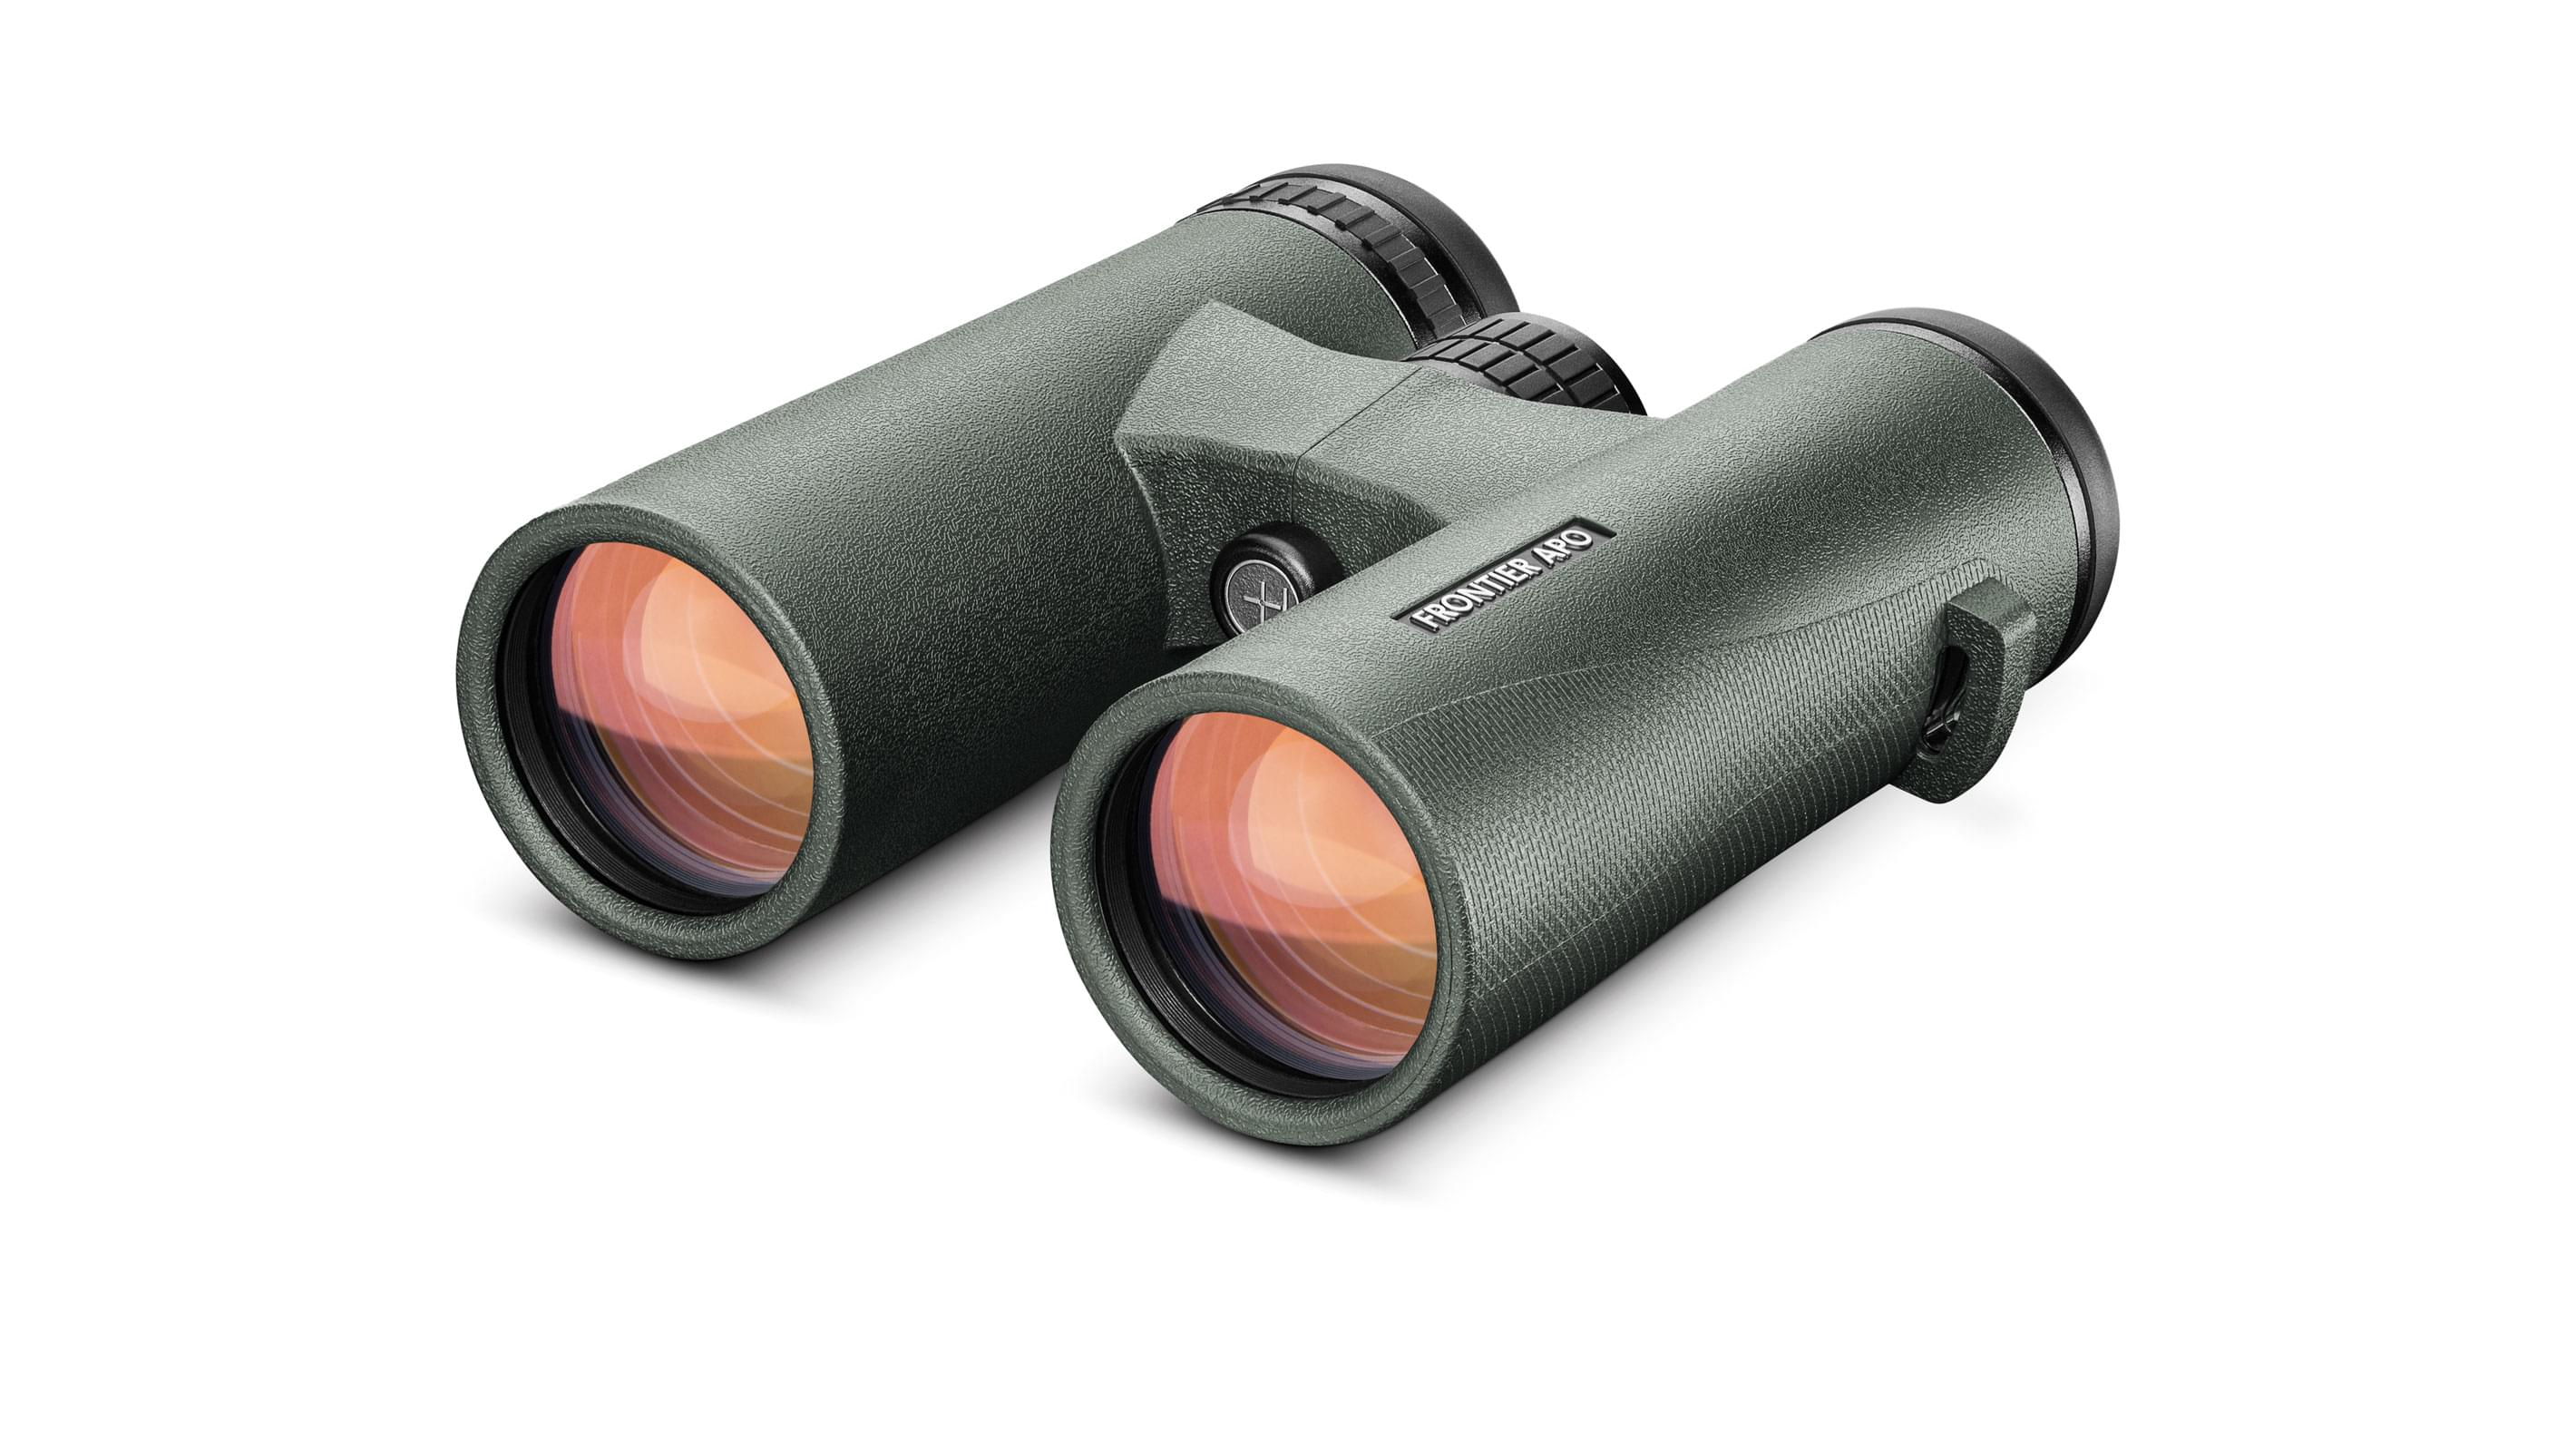 Frontier APO 8x42 Binocular - Green